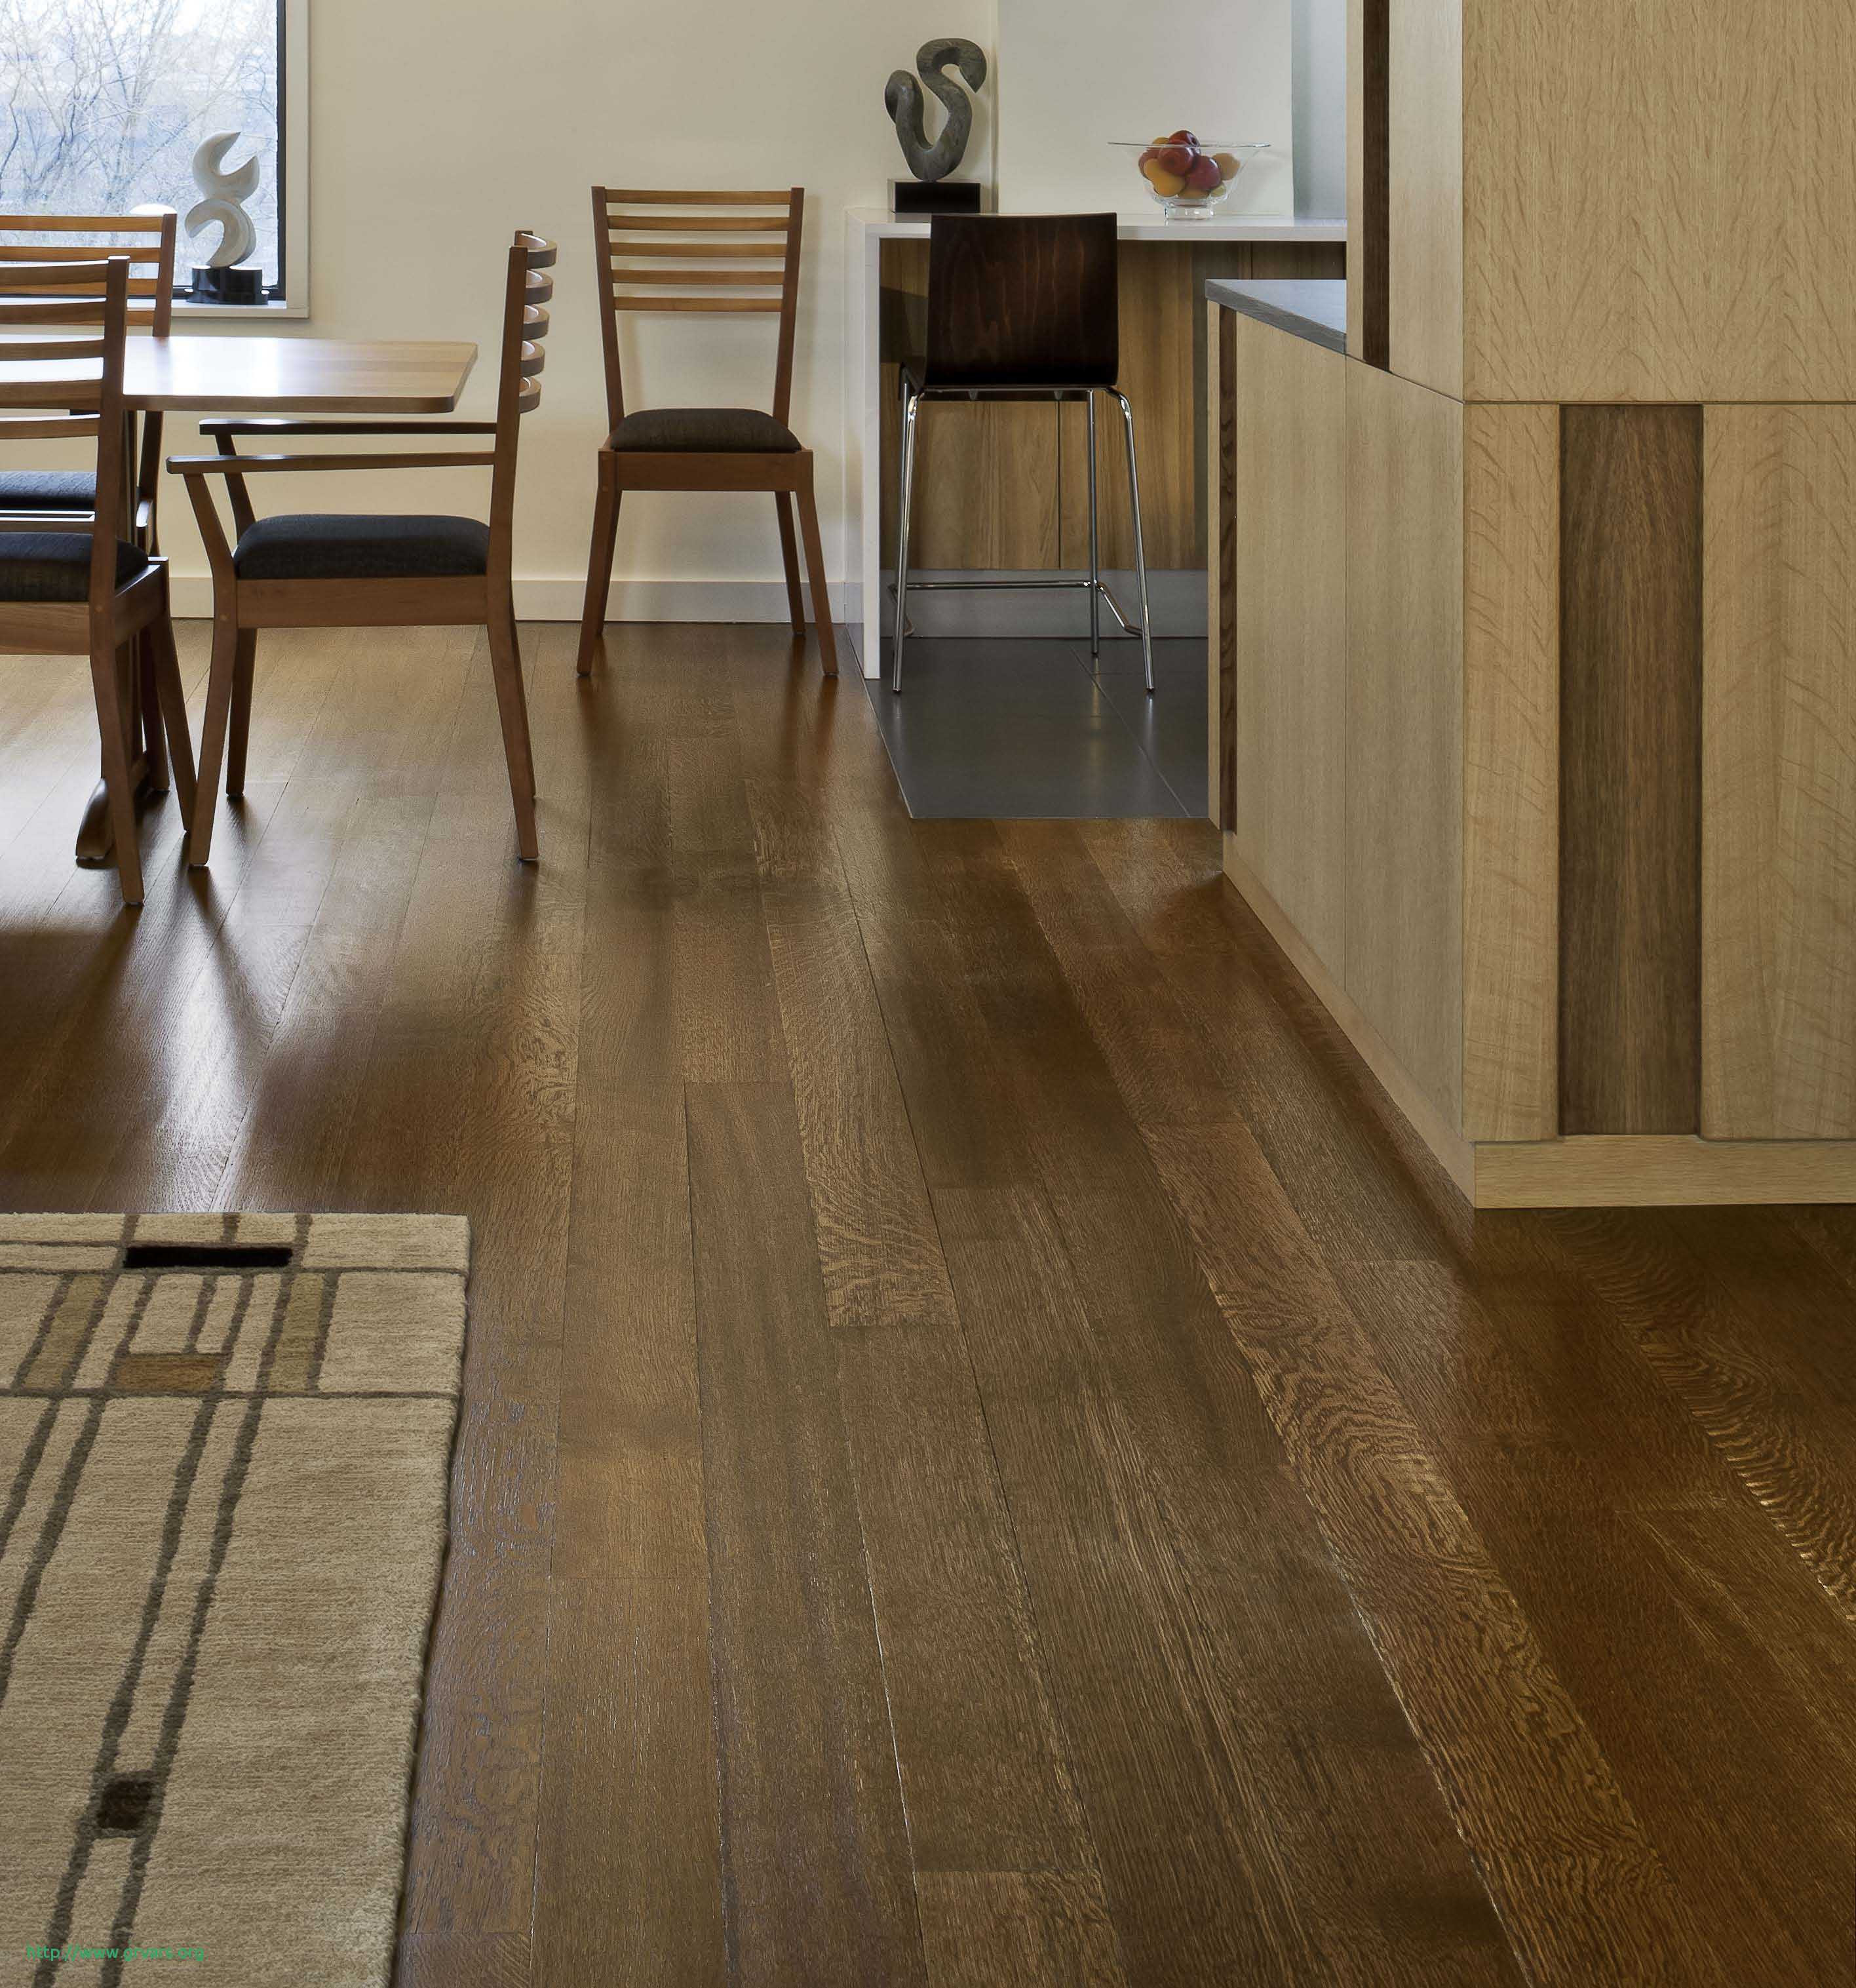 unfinished hardwood flooring atlanta of 21 beau cheapest hardwood flooring in toronto ideas blog in cheapest hardwood flooring in toronto impressionnant fabulous discount hardwood flooring 0 floor brampton 25 toronto